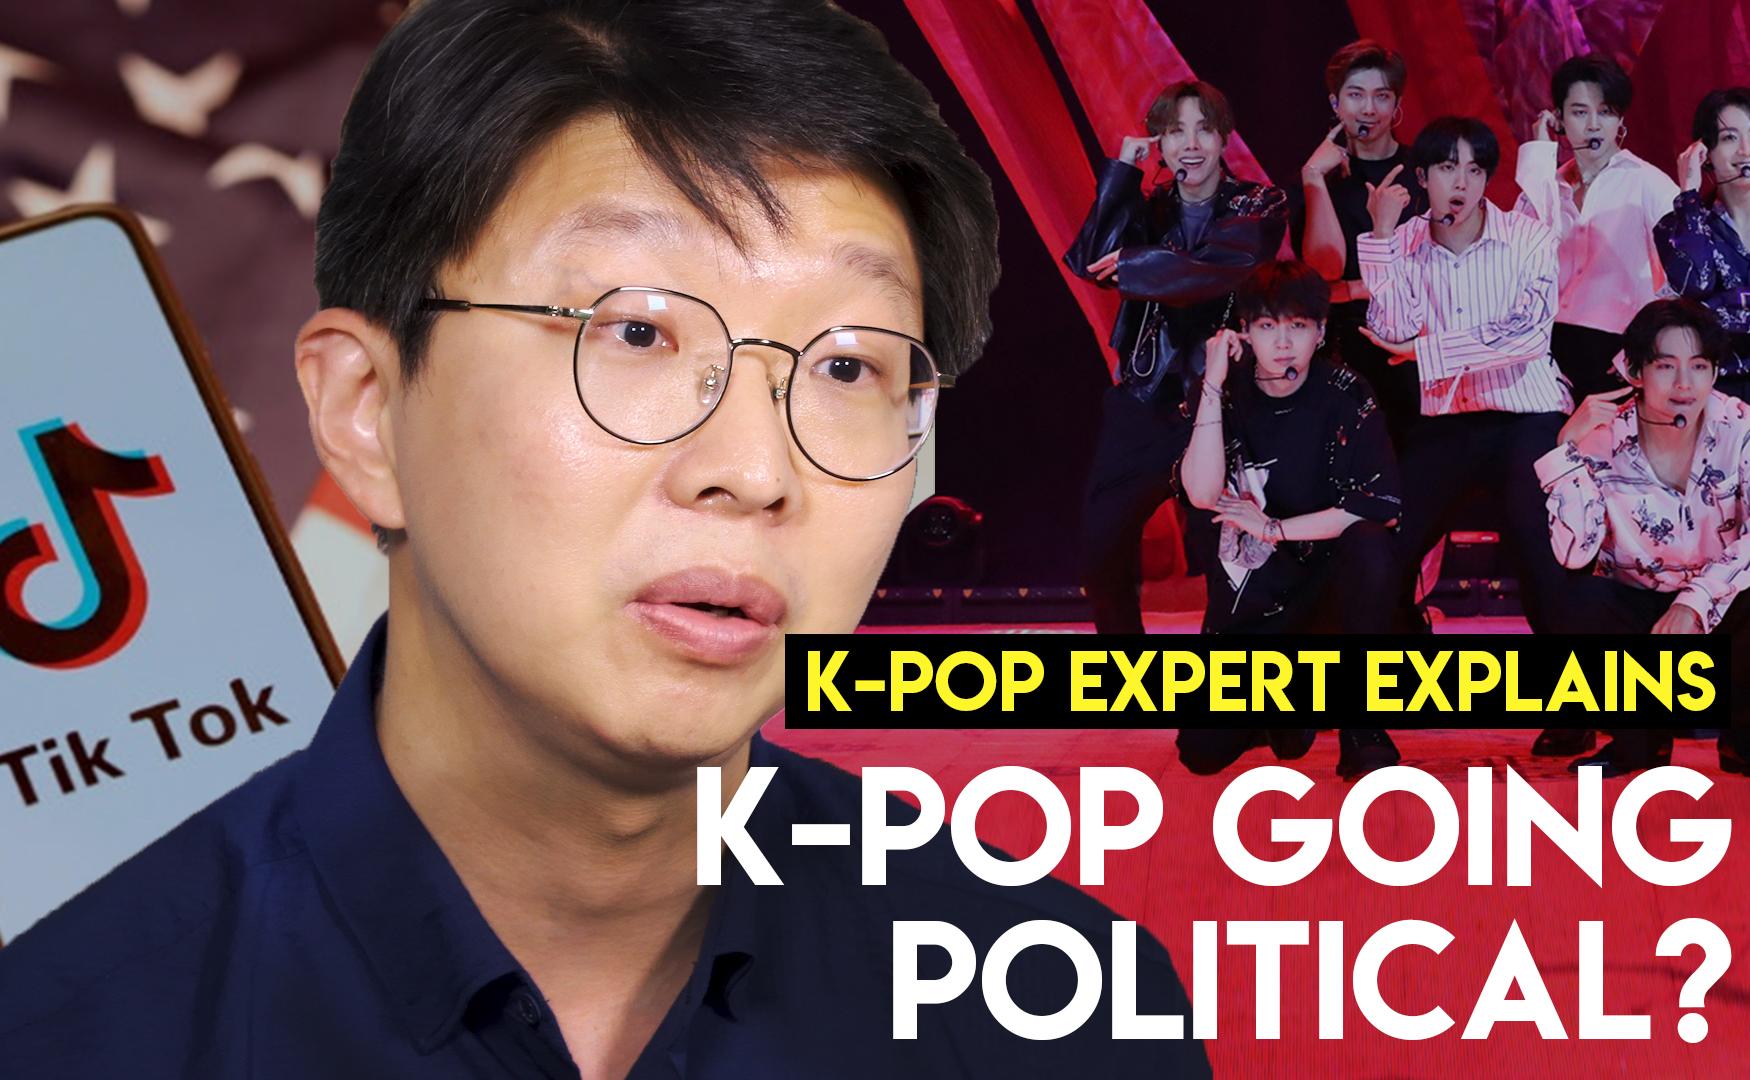 Debate: Should K-pop be apolitical vs. politcal? [VIDEO]